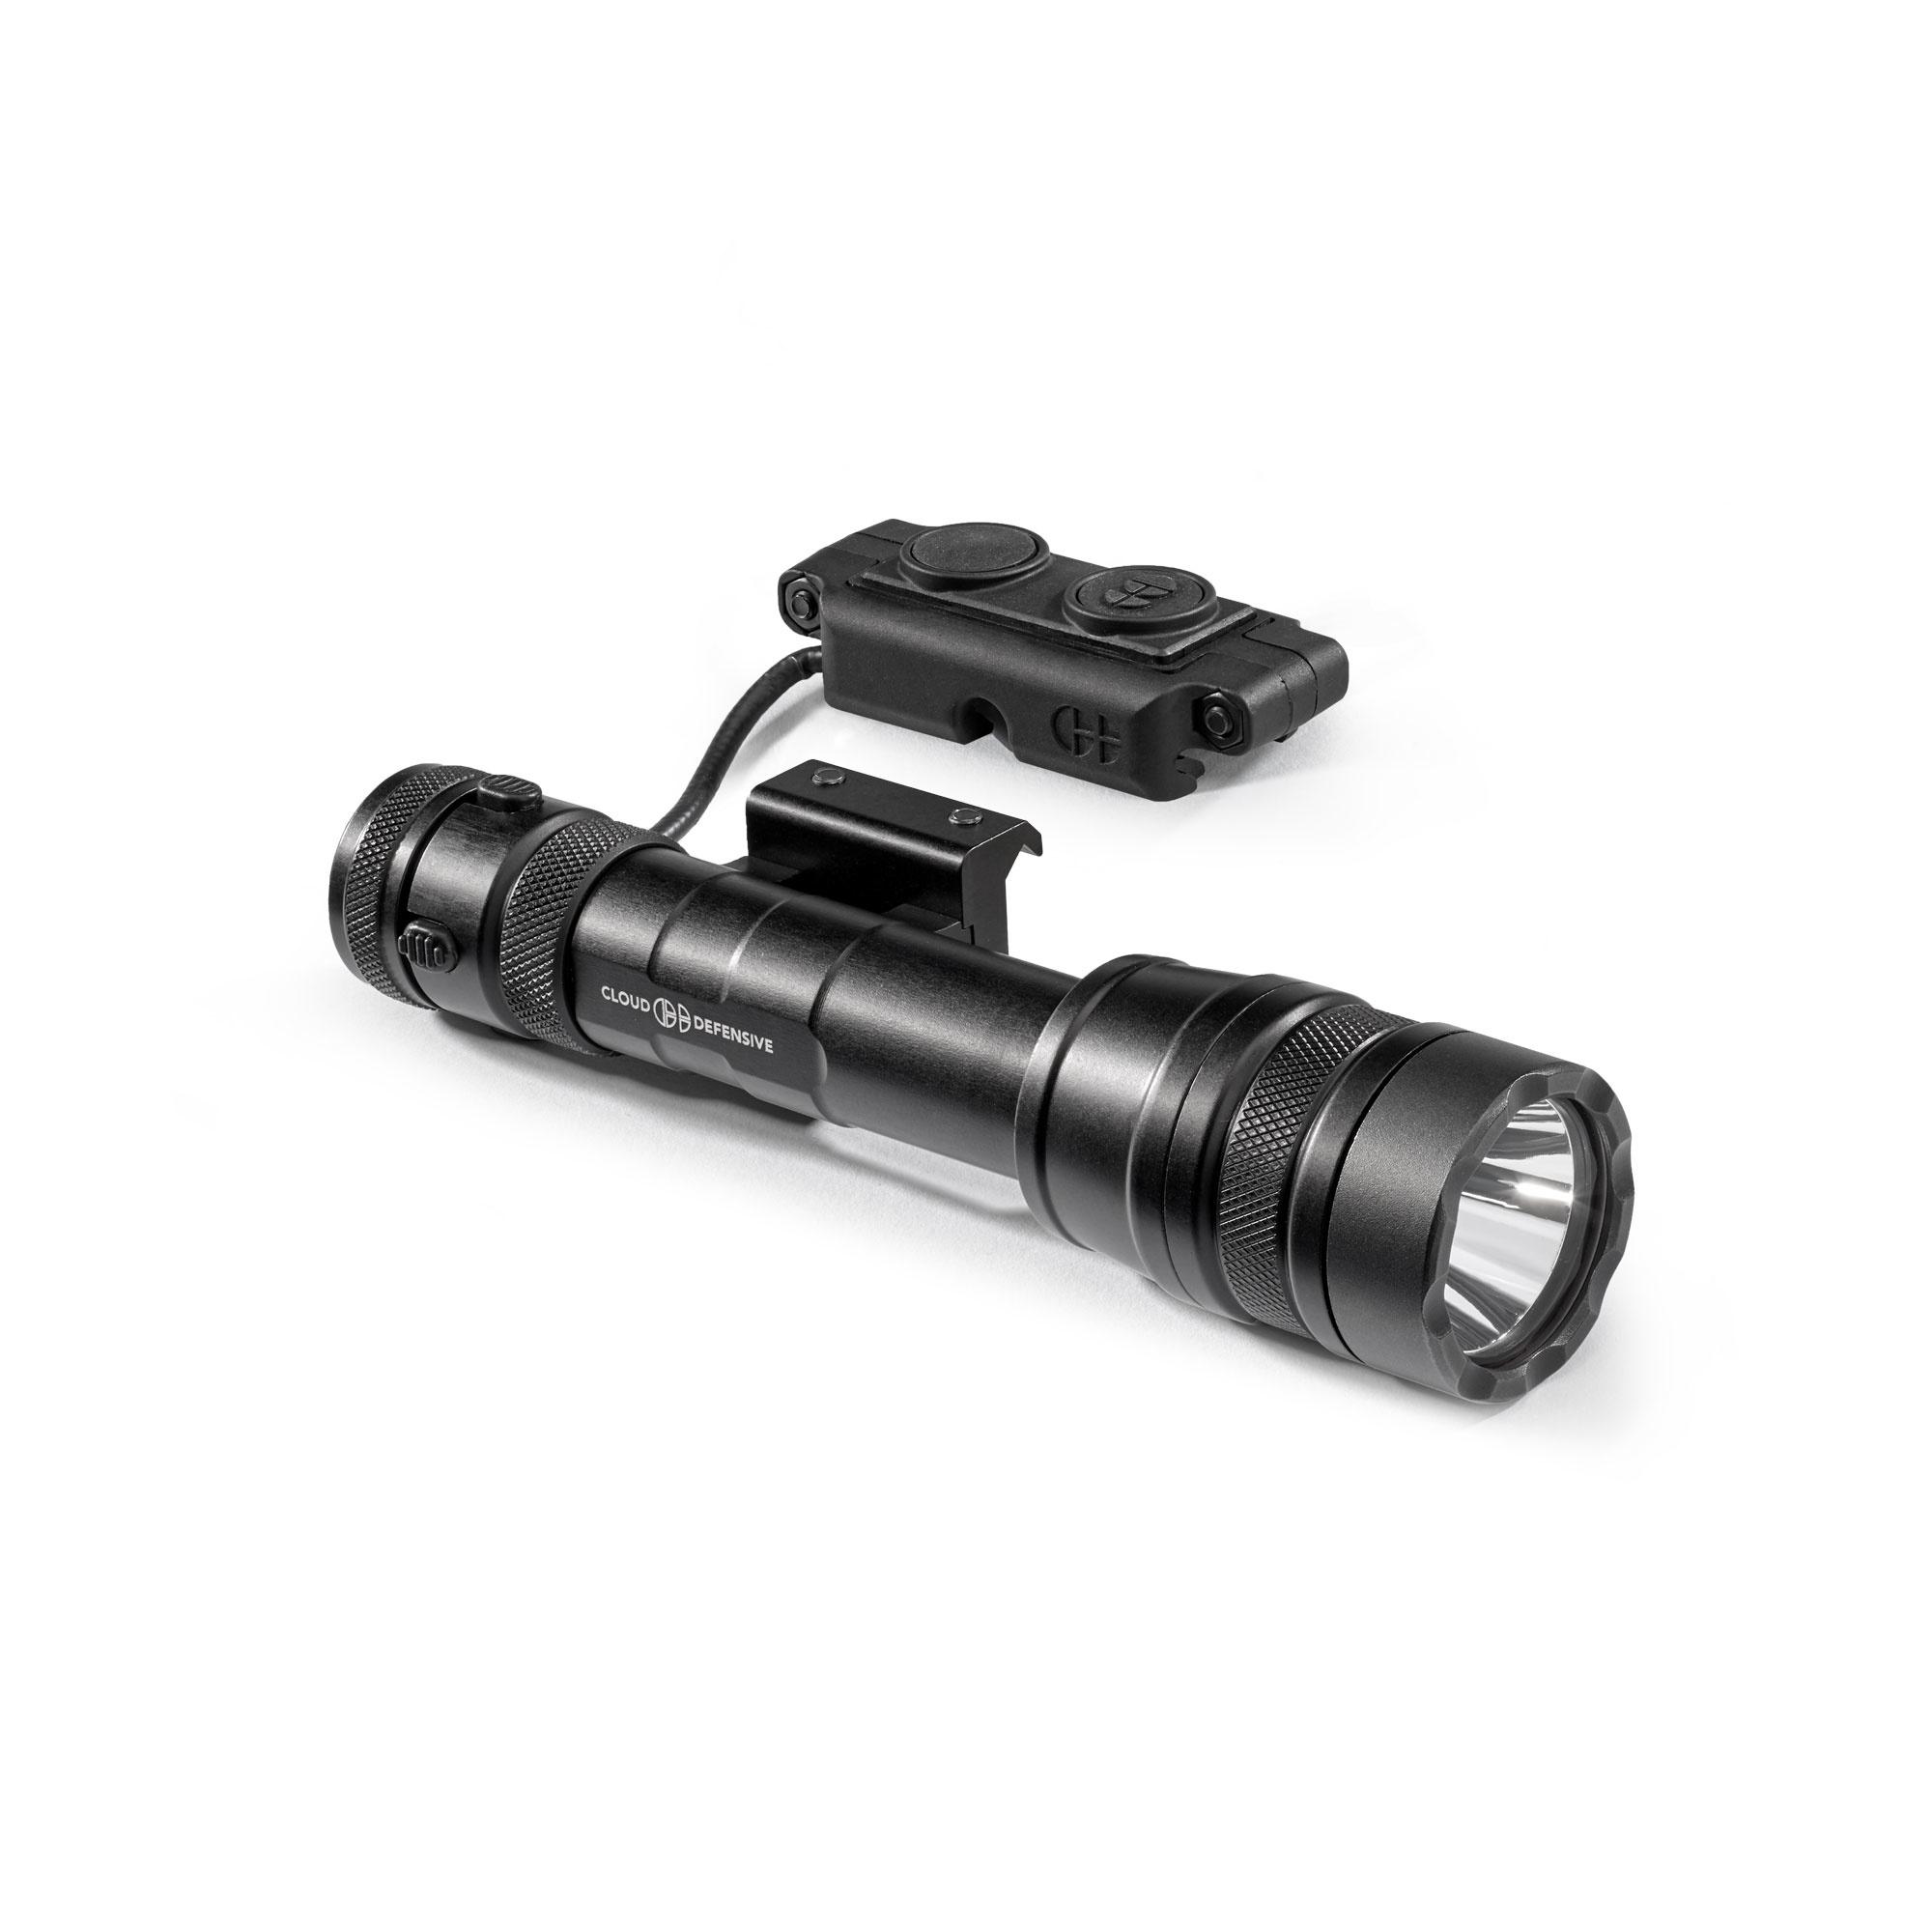 Cloud Defensive Cloud Defensive REIN weapon light kit